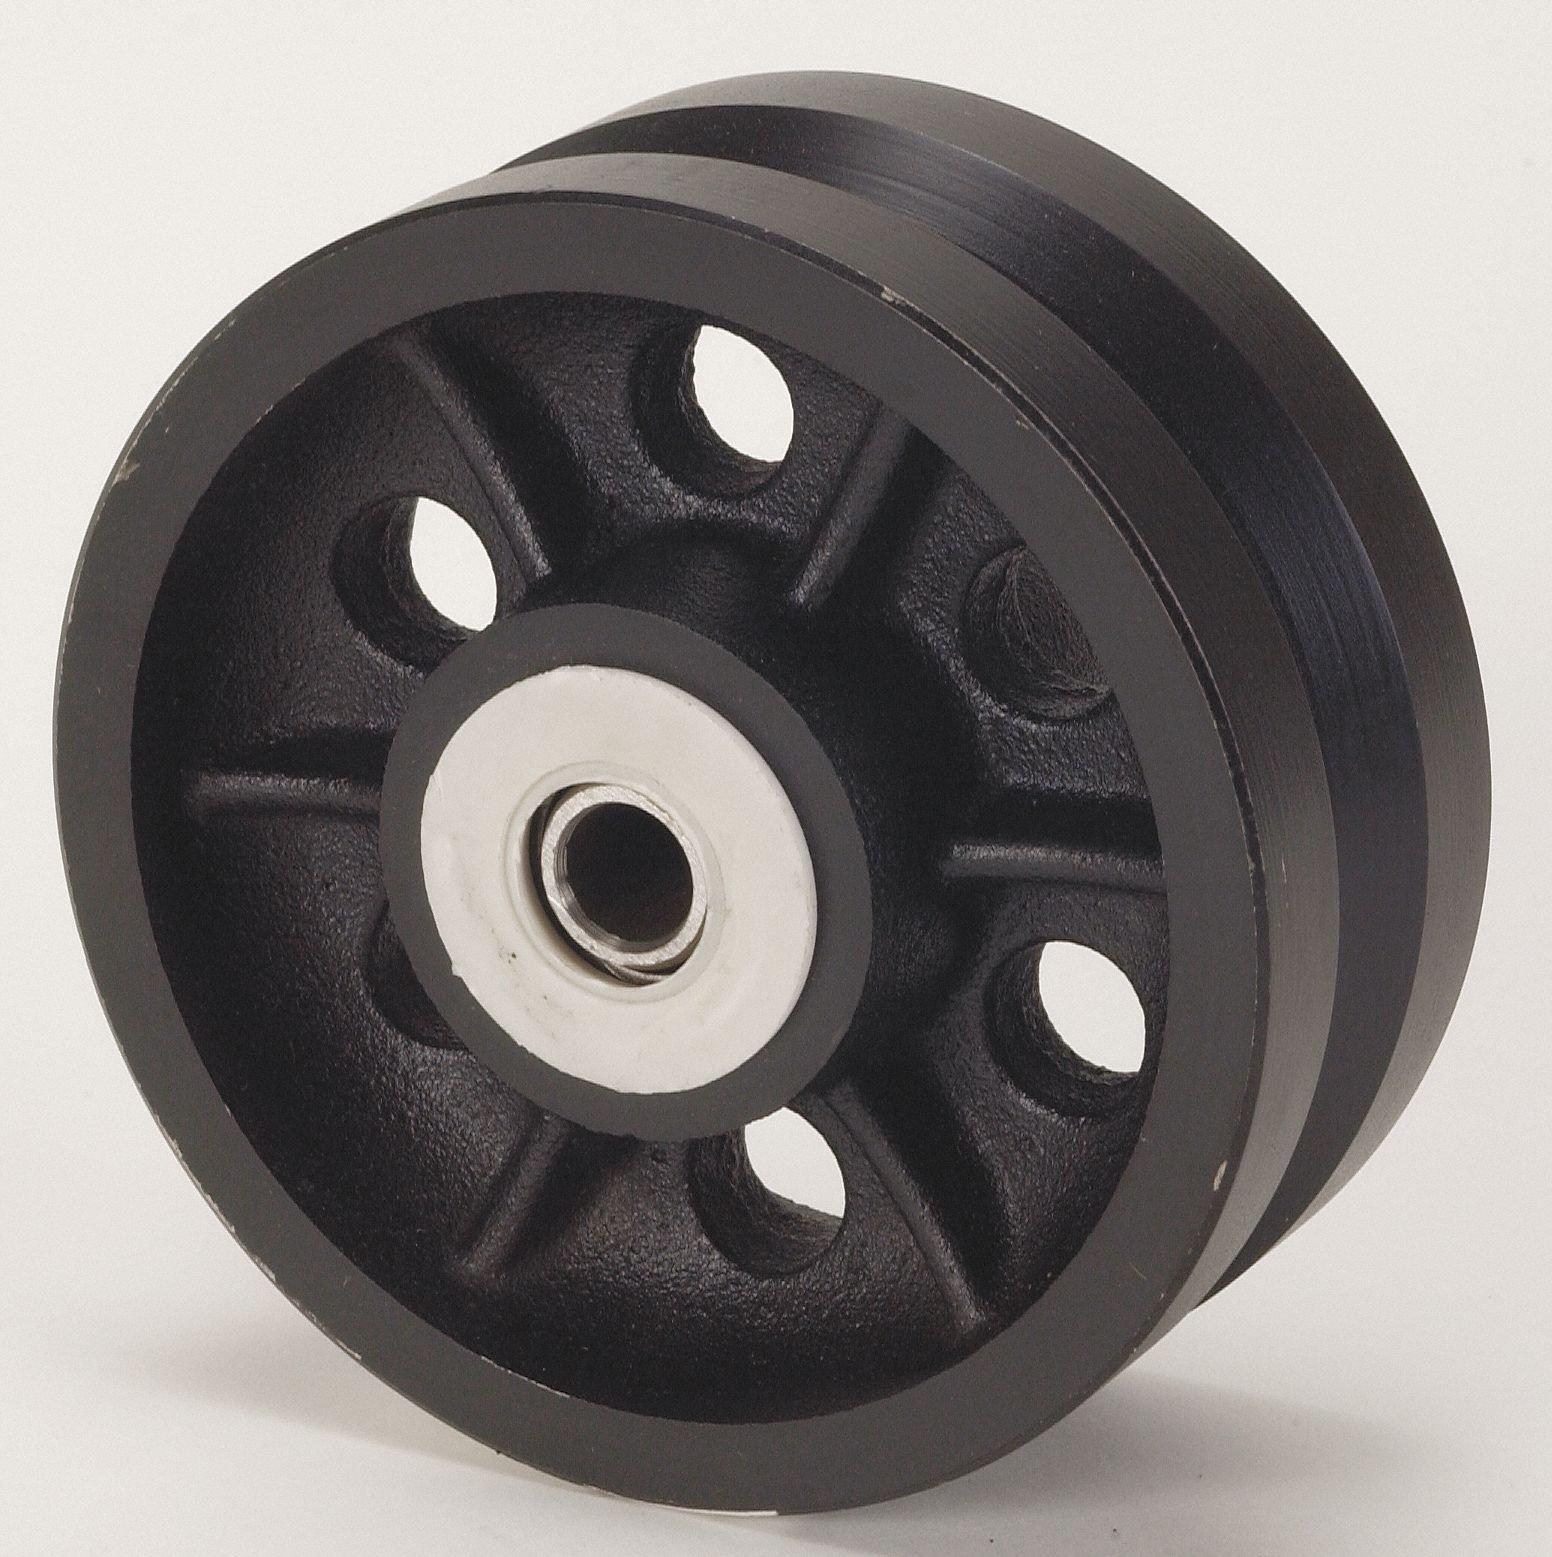 5'' Caster Wheel, 900 lb. Load Rating, Wheel Width 2'', Cast Iron, Fits Axle Dia. 1/2''